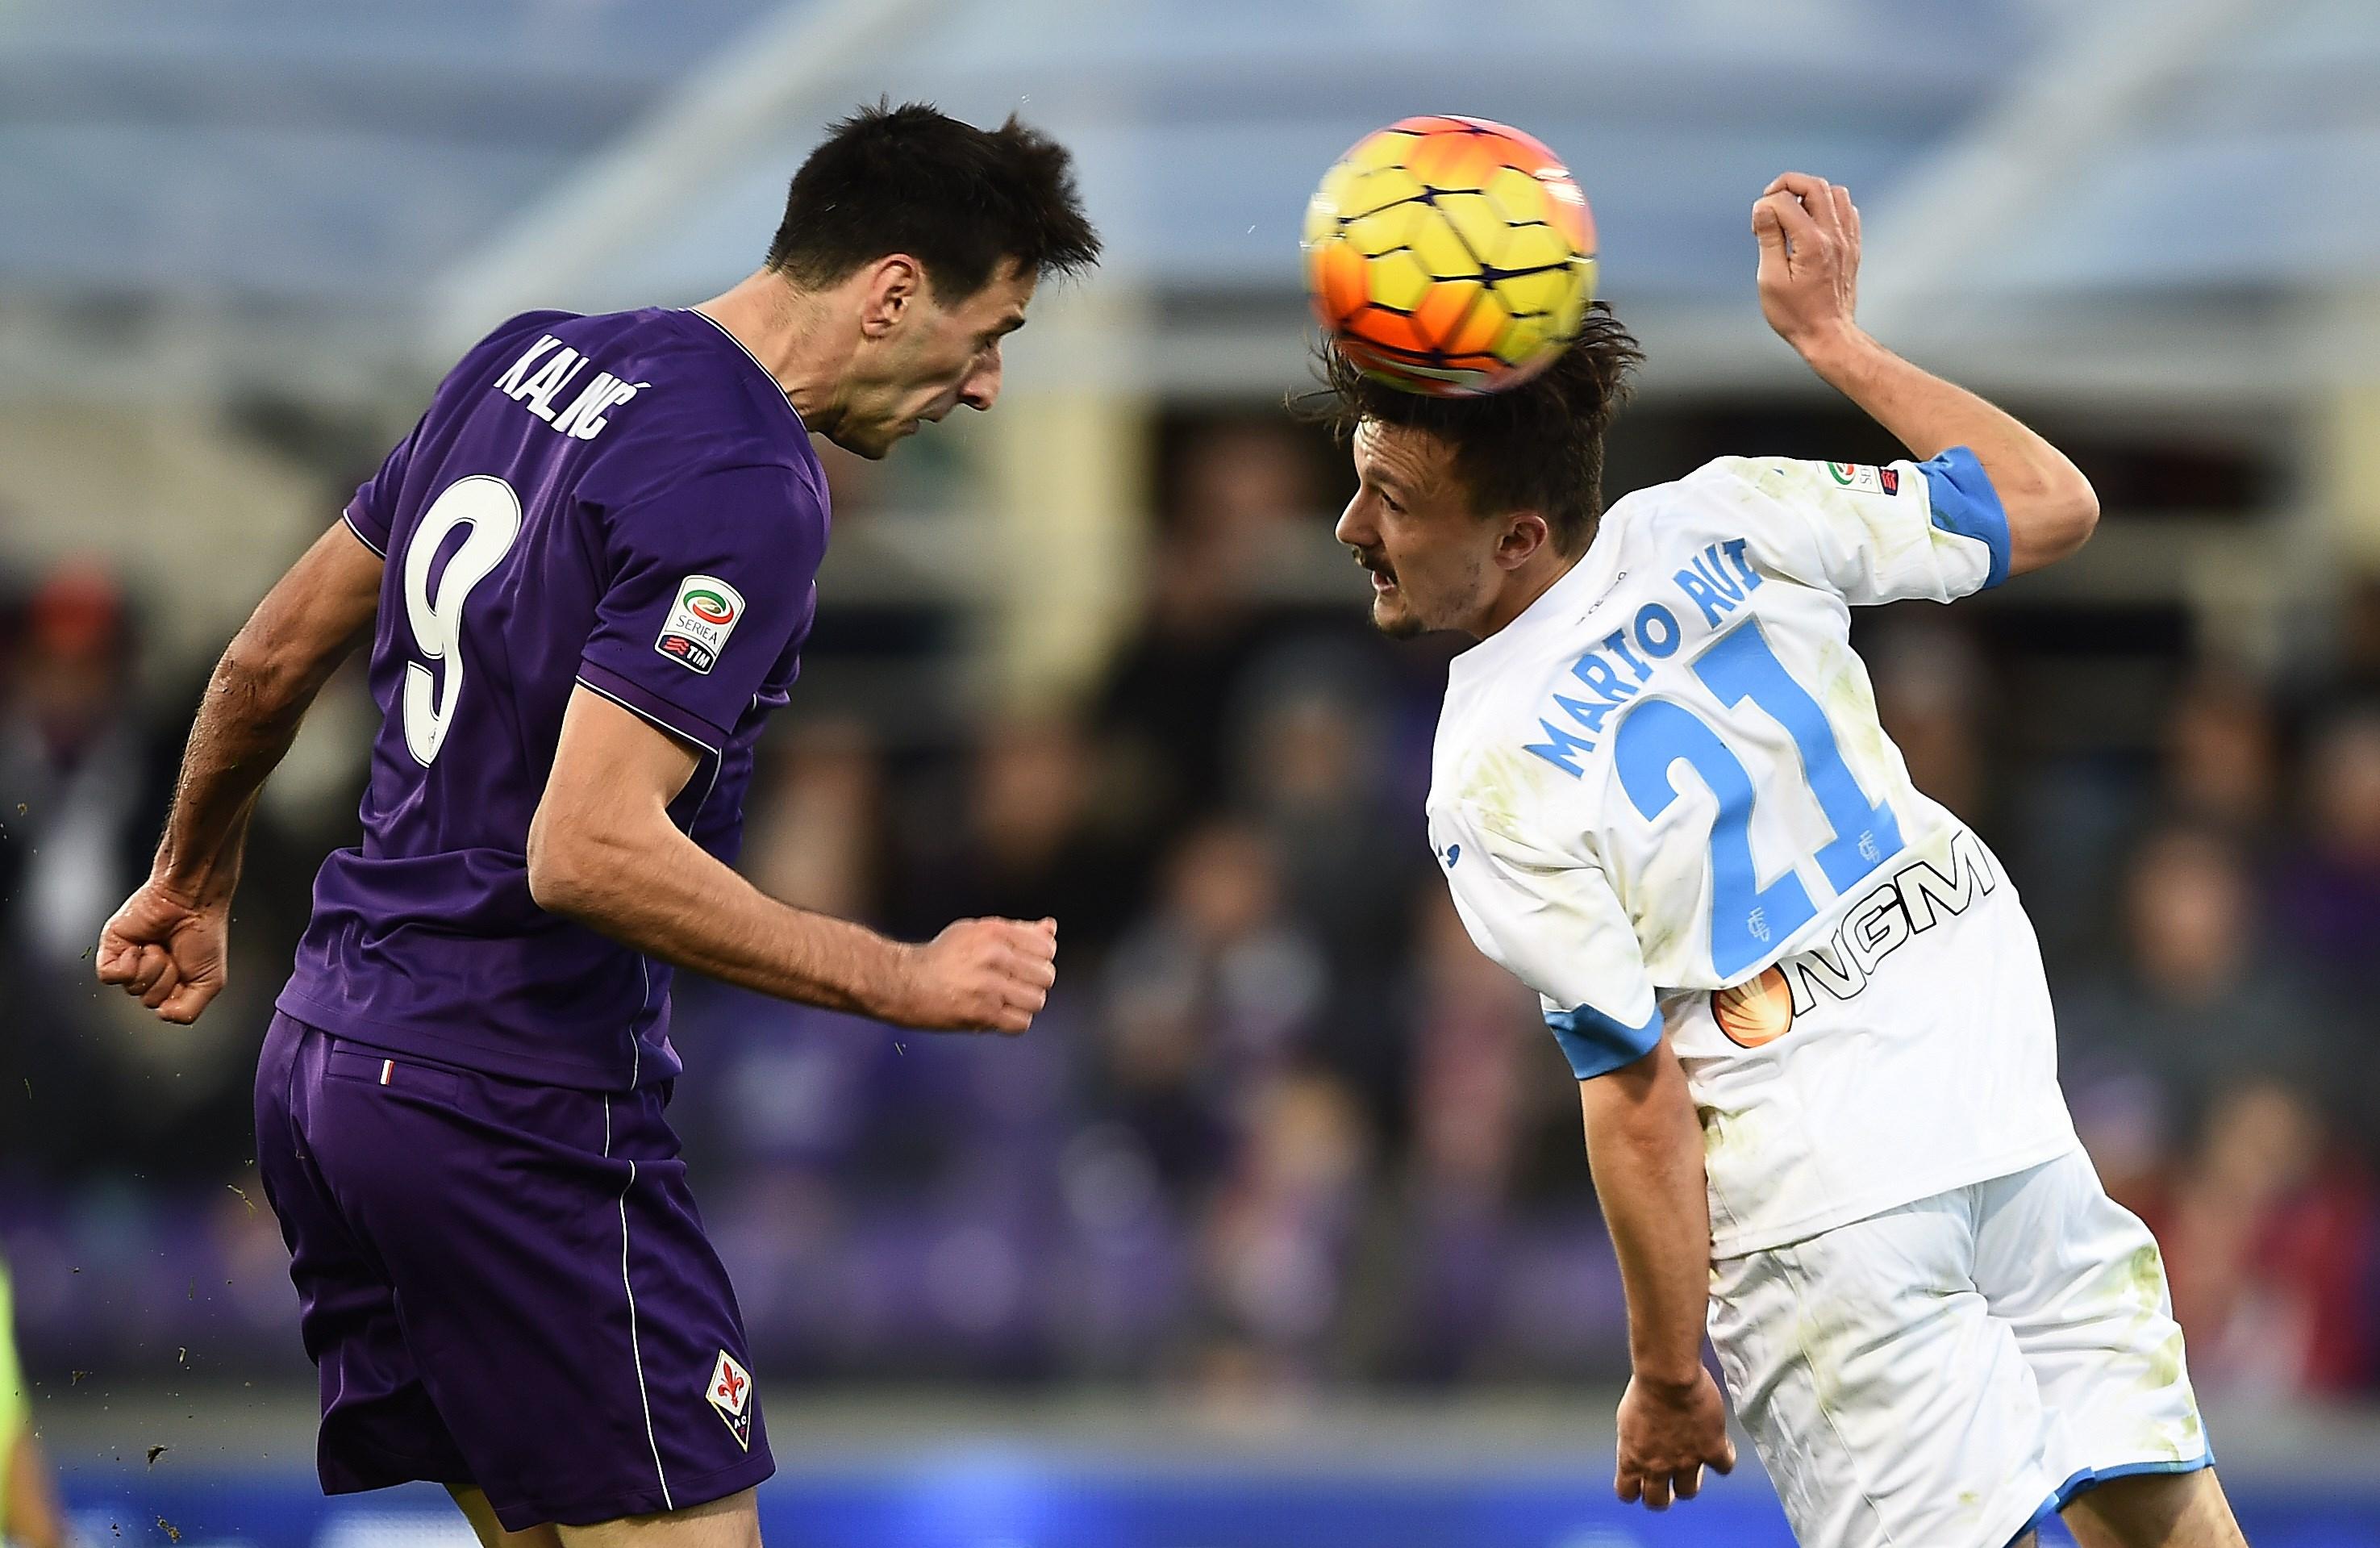 Fiorentina's forward from Croatia Nikola Kalinic (L) heads the ball to score during the Italian Serie A football match Fiorentina vs Empoli at the Artemio Franchi Stadium on November 22, 2015 in Florence.   AFP PHOTO / FILIPPO MONTEFORTE